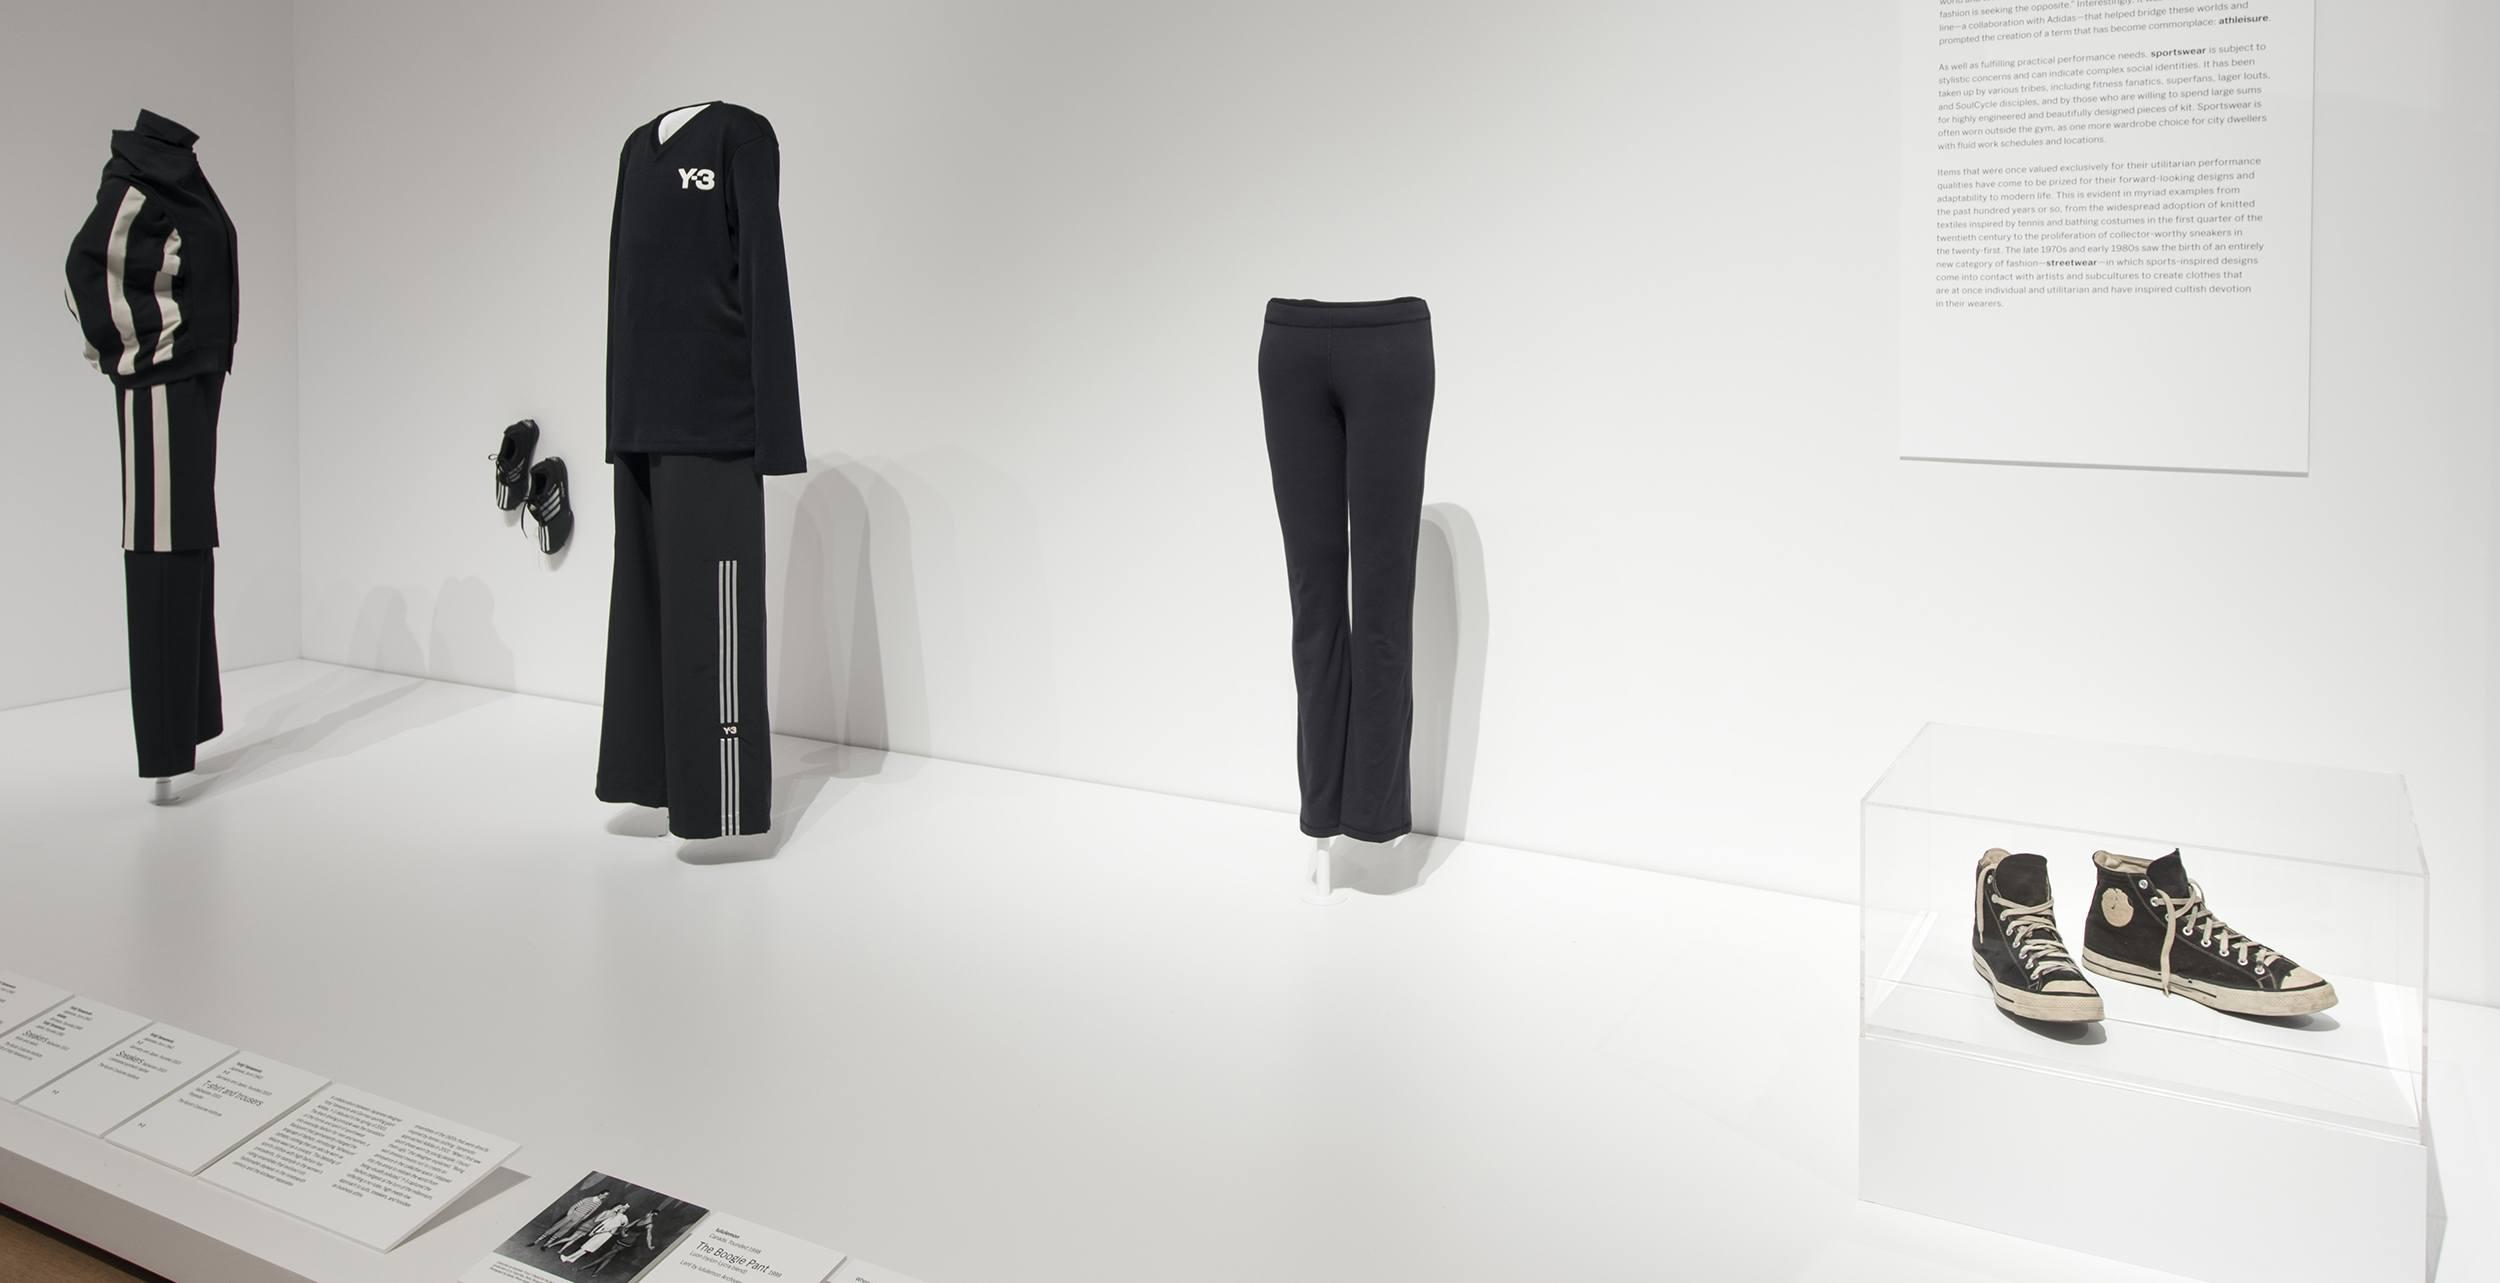 Lululemon yoga pants featured in MoMA fashion design exhibition